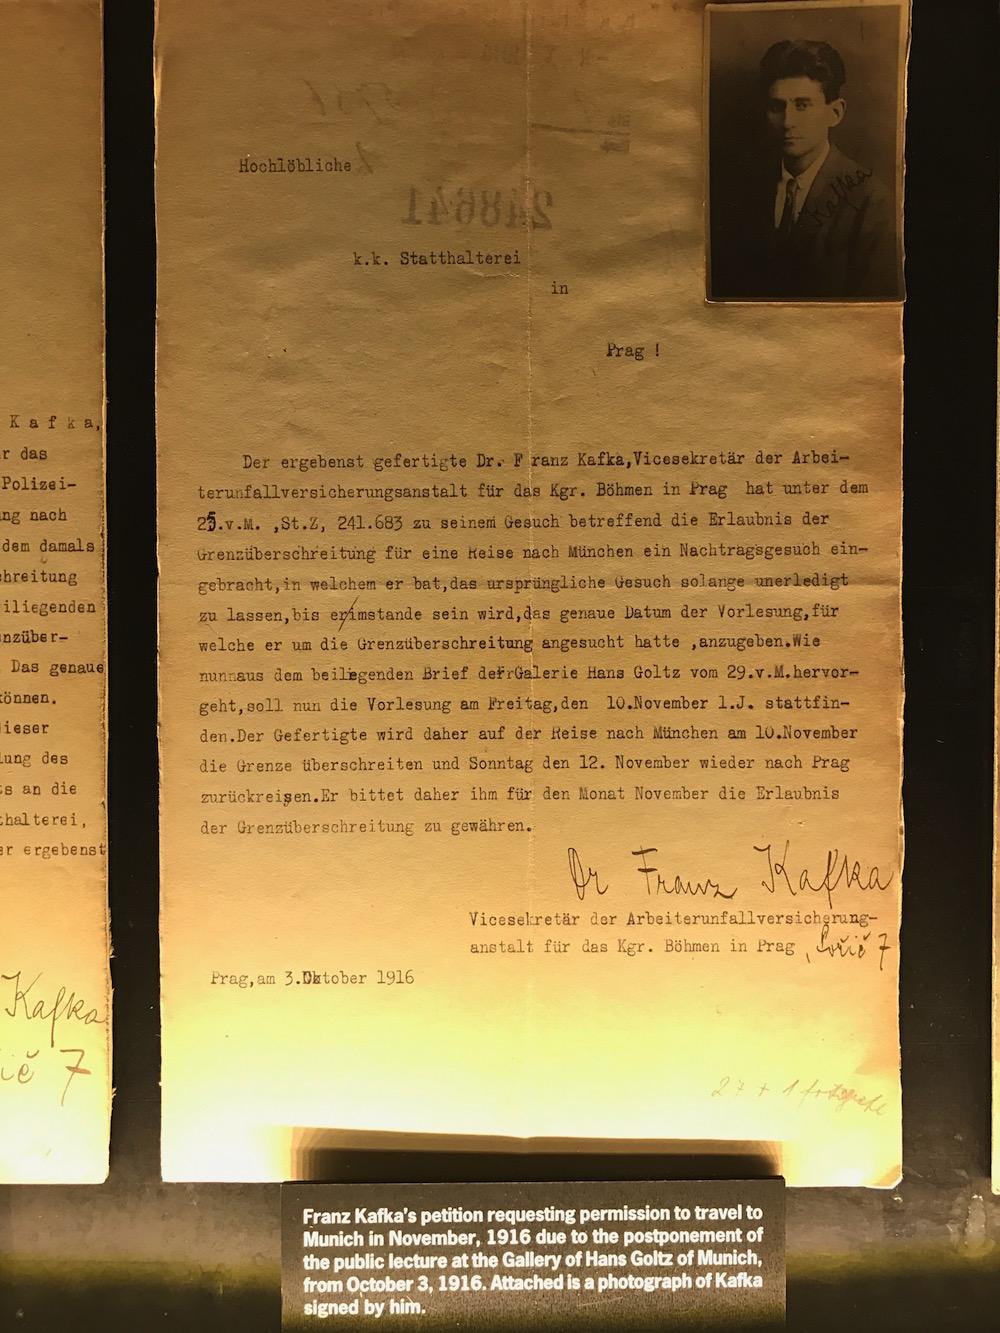 franz kafka dilekçe el yazısı